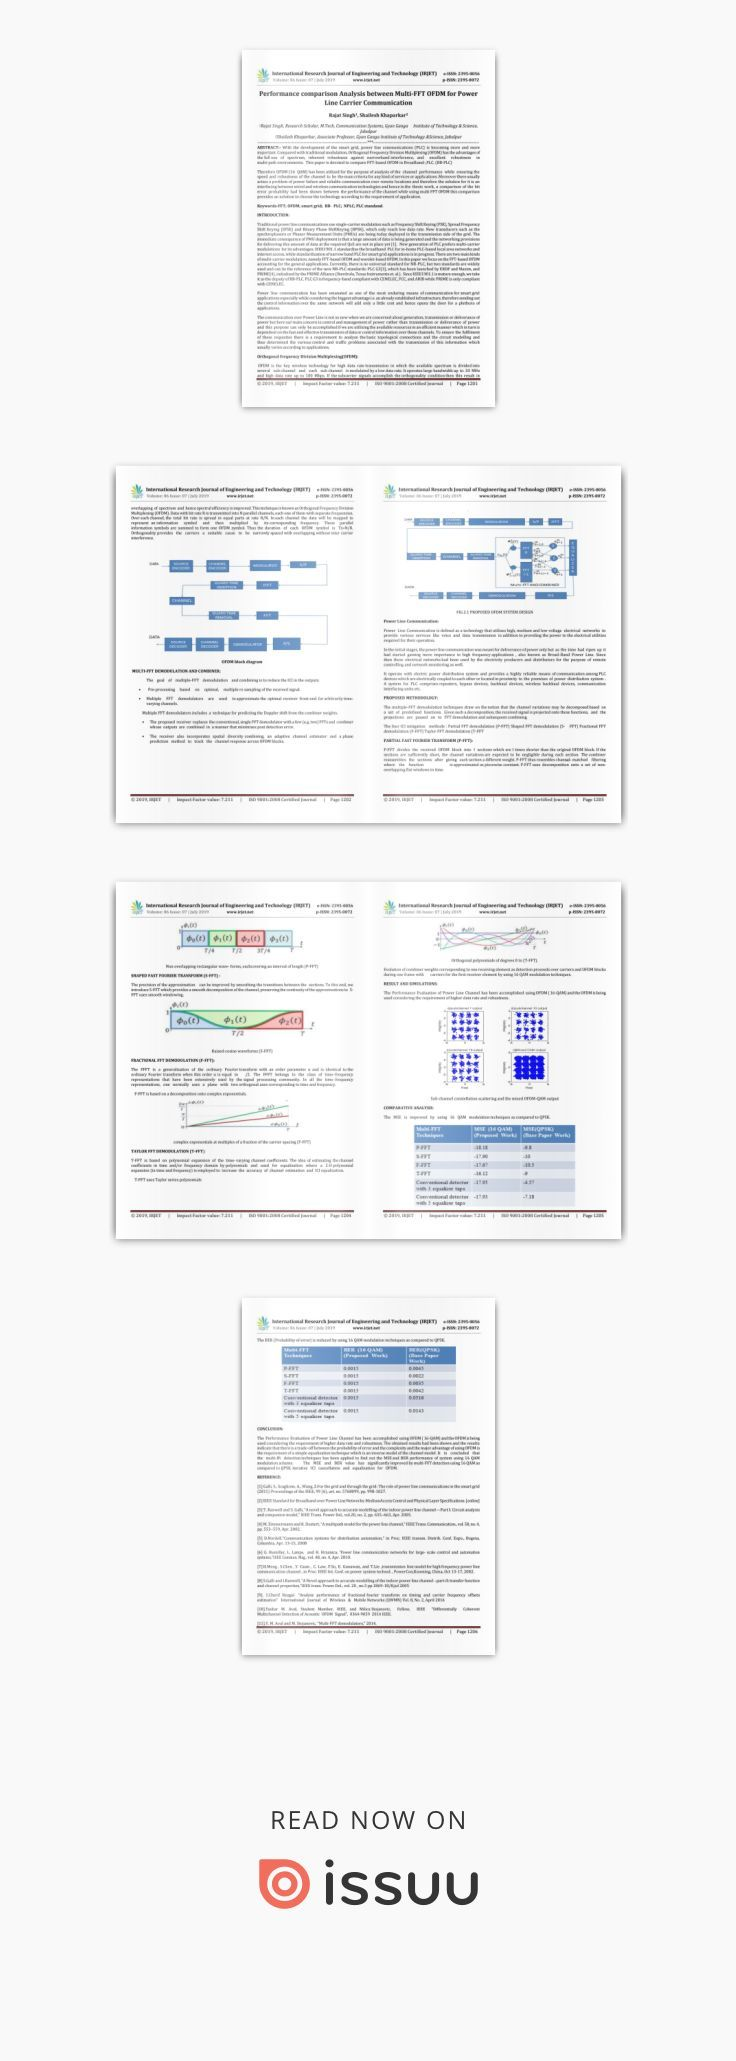 IRJET Performance Comparison Analysis between MultiFFT